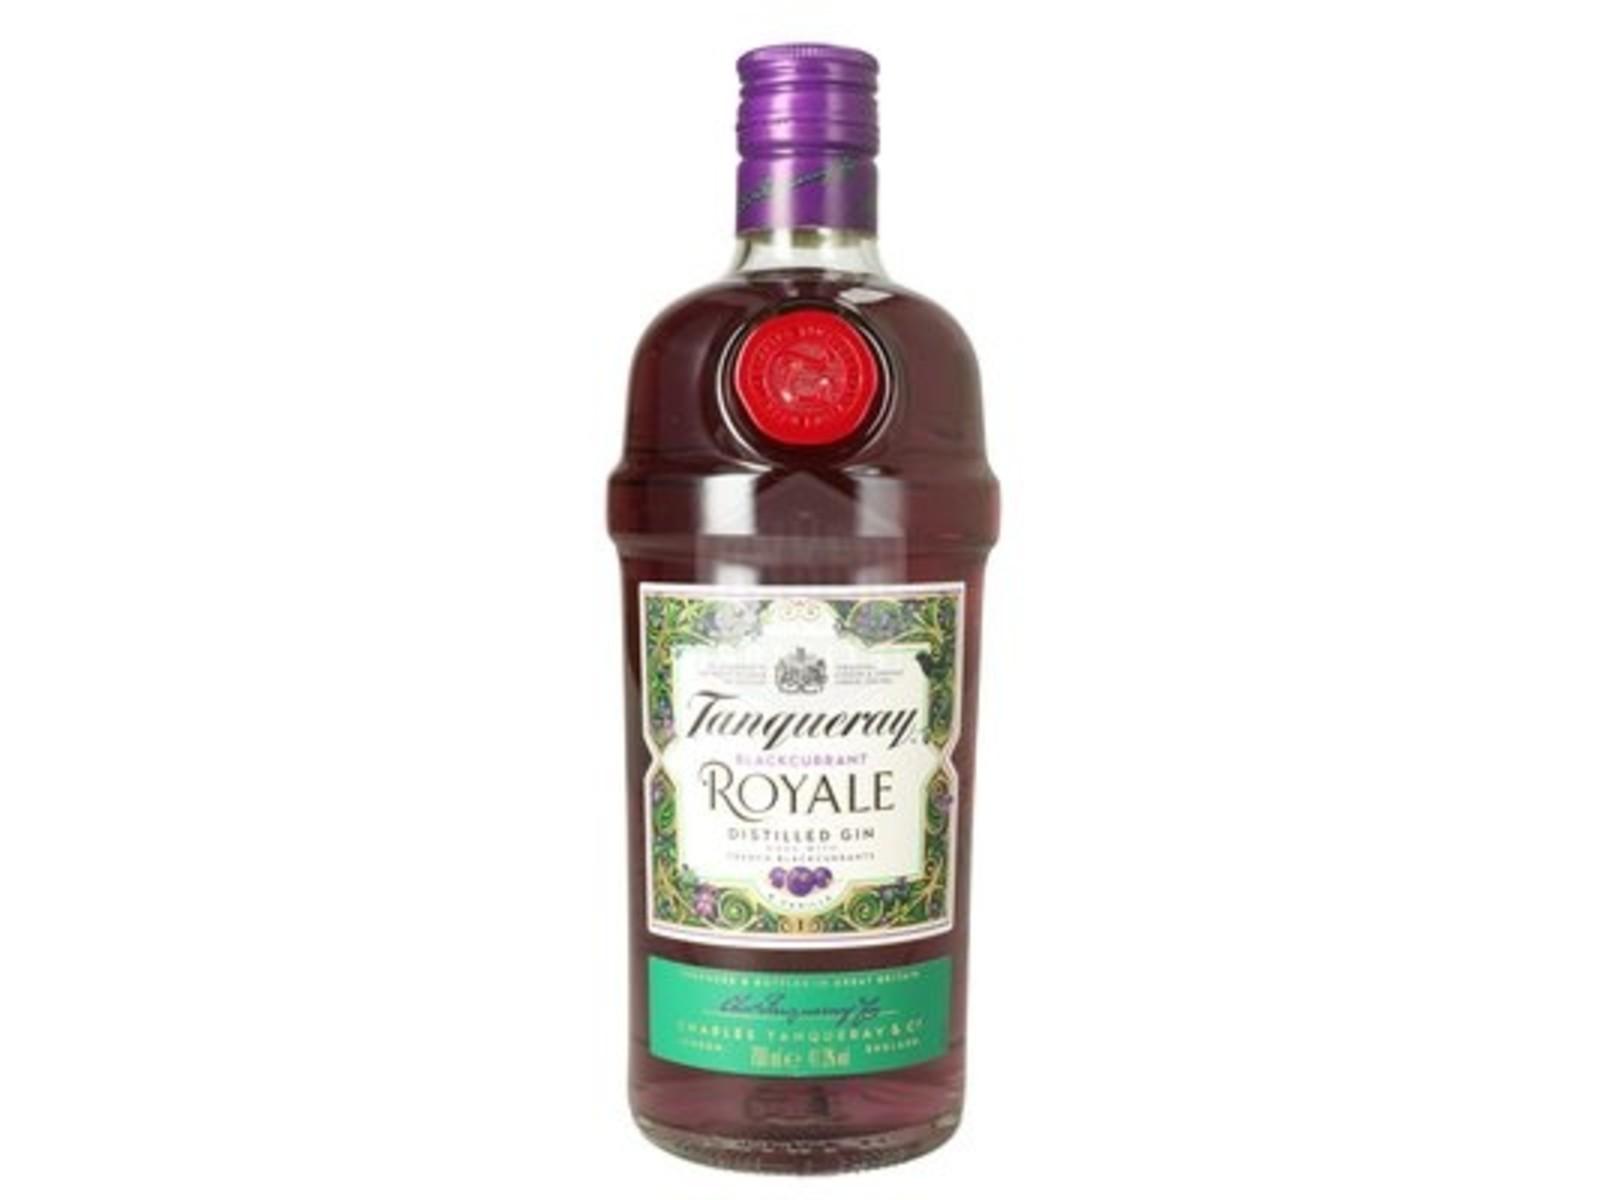 Tanqueray Tanqueray / Blackcurrant Royale Gin